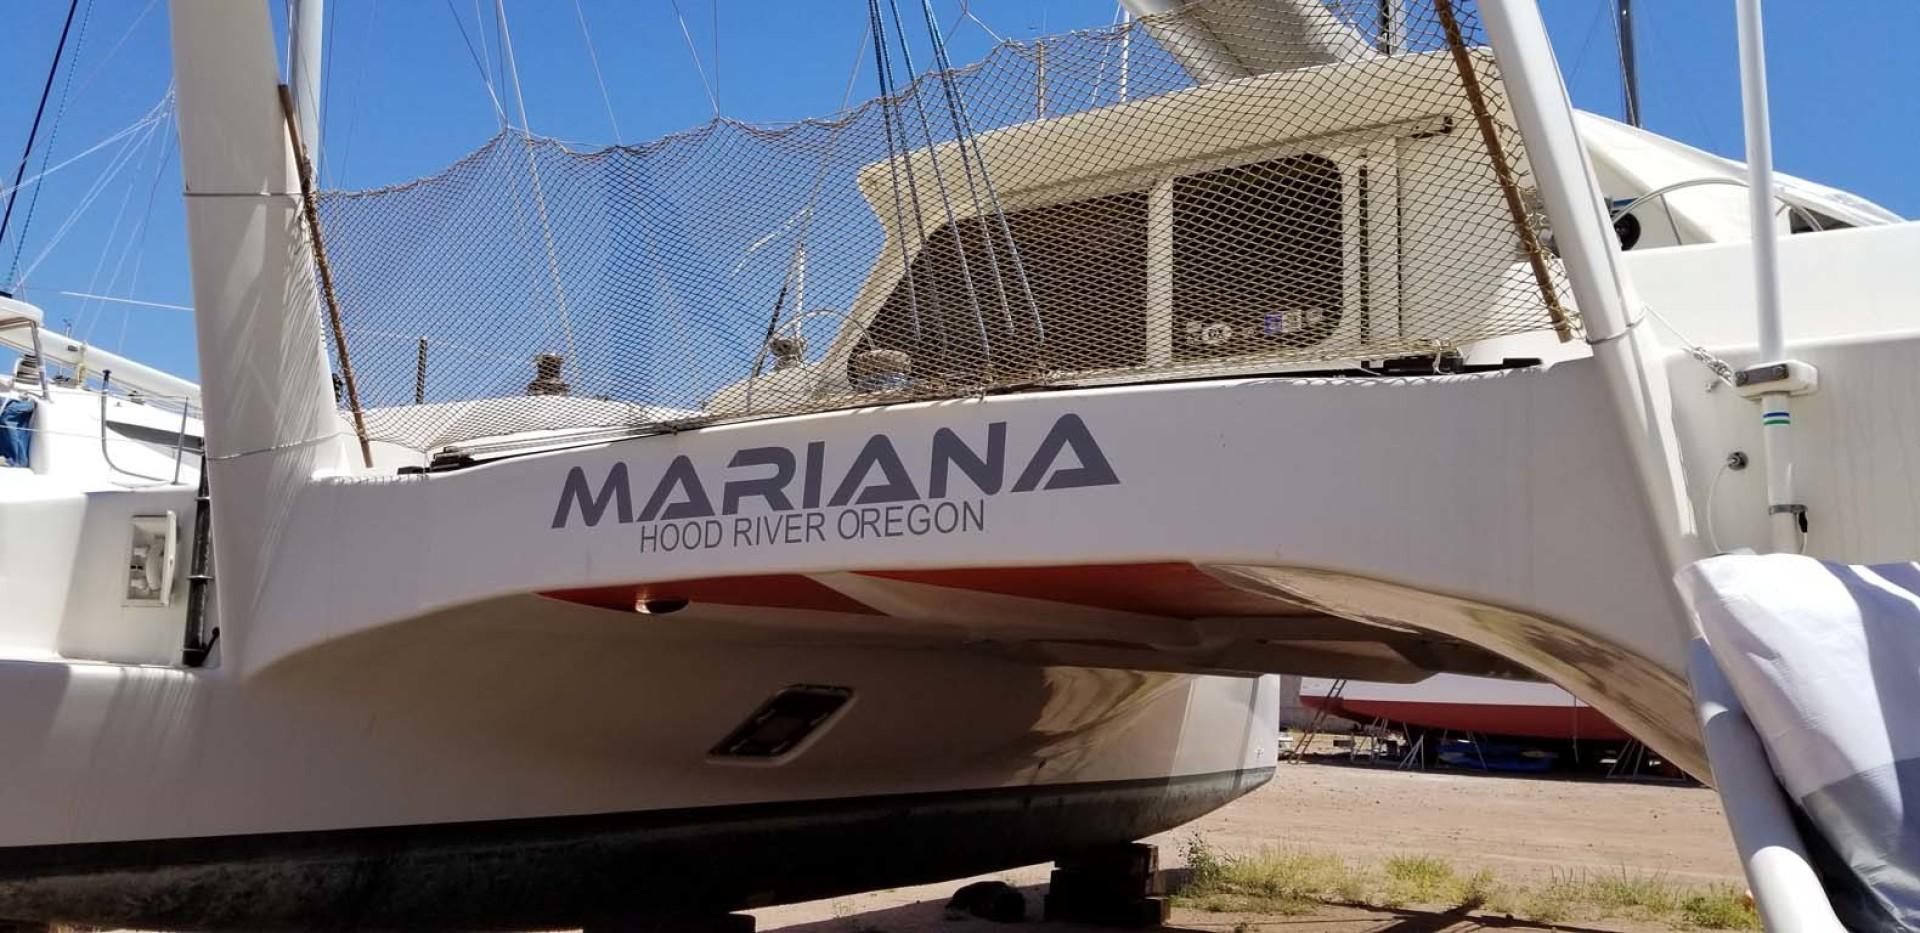 Farrier-44 SC 2014-Mariana Guaymas, SONORA-Mexico-Stern-1159498 | Thumbnail